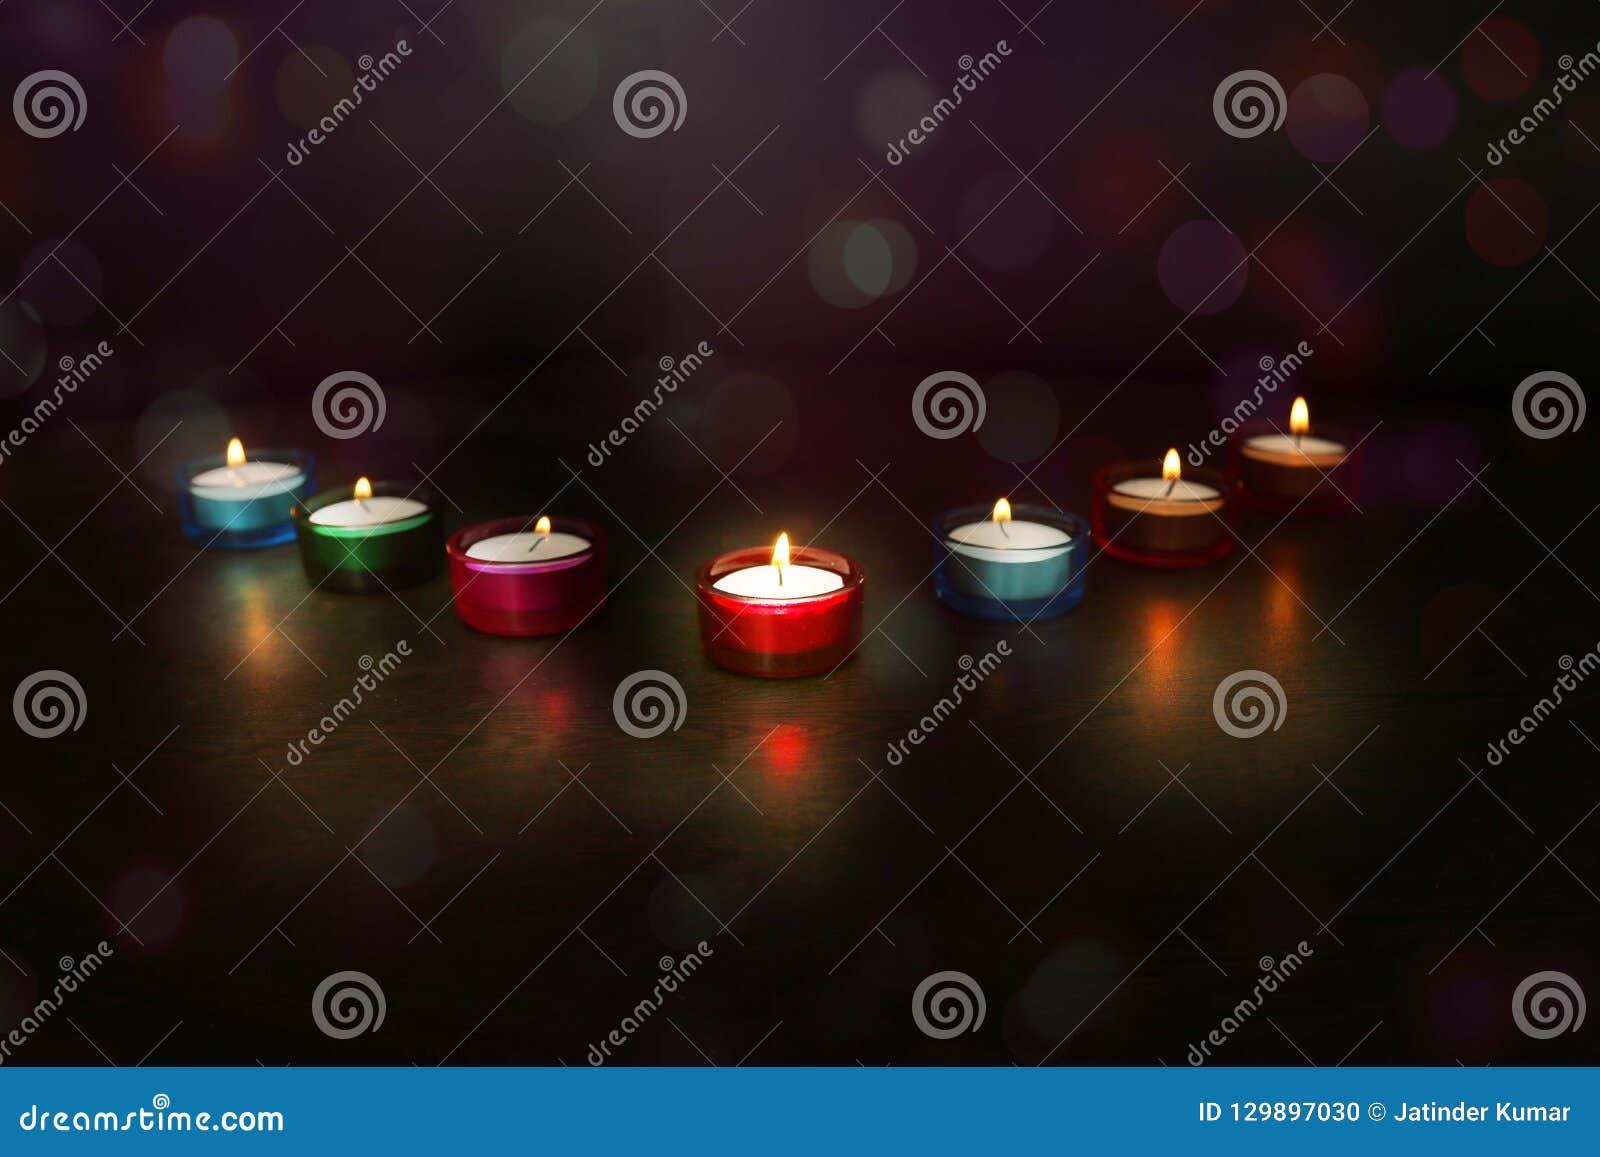 Indian festival Diwali. Picture of Diya lamps